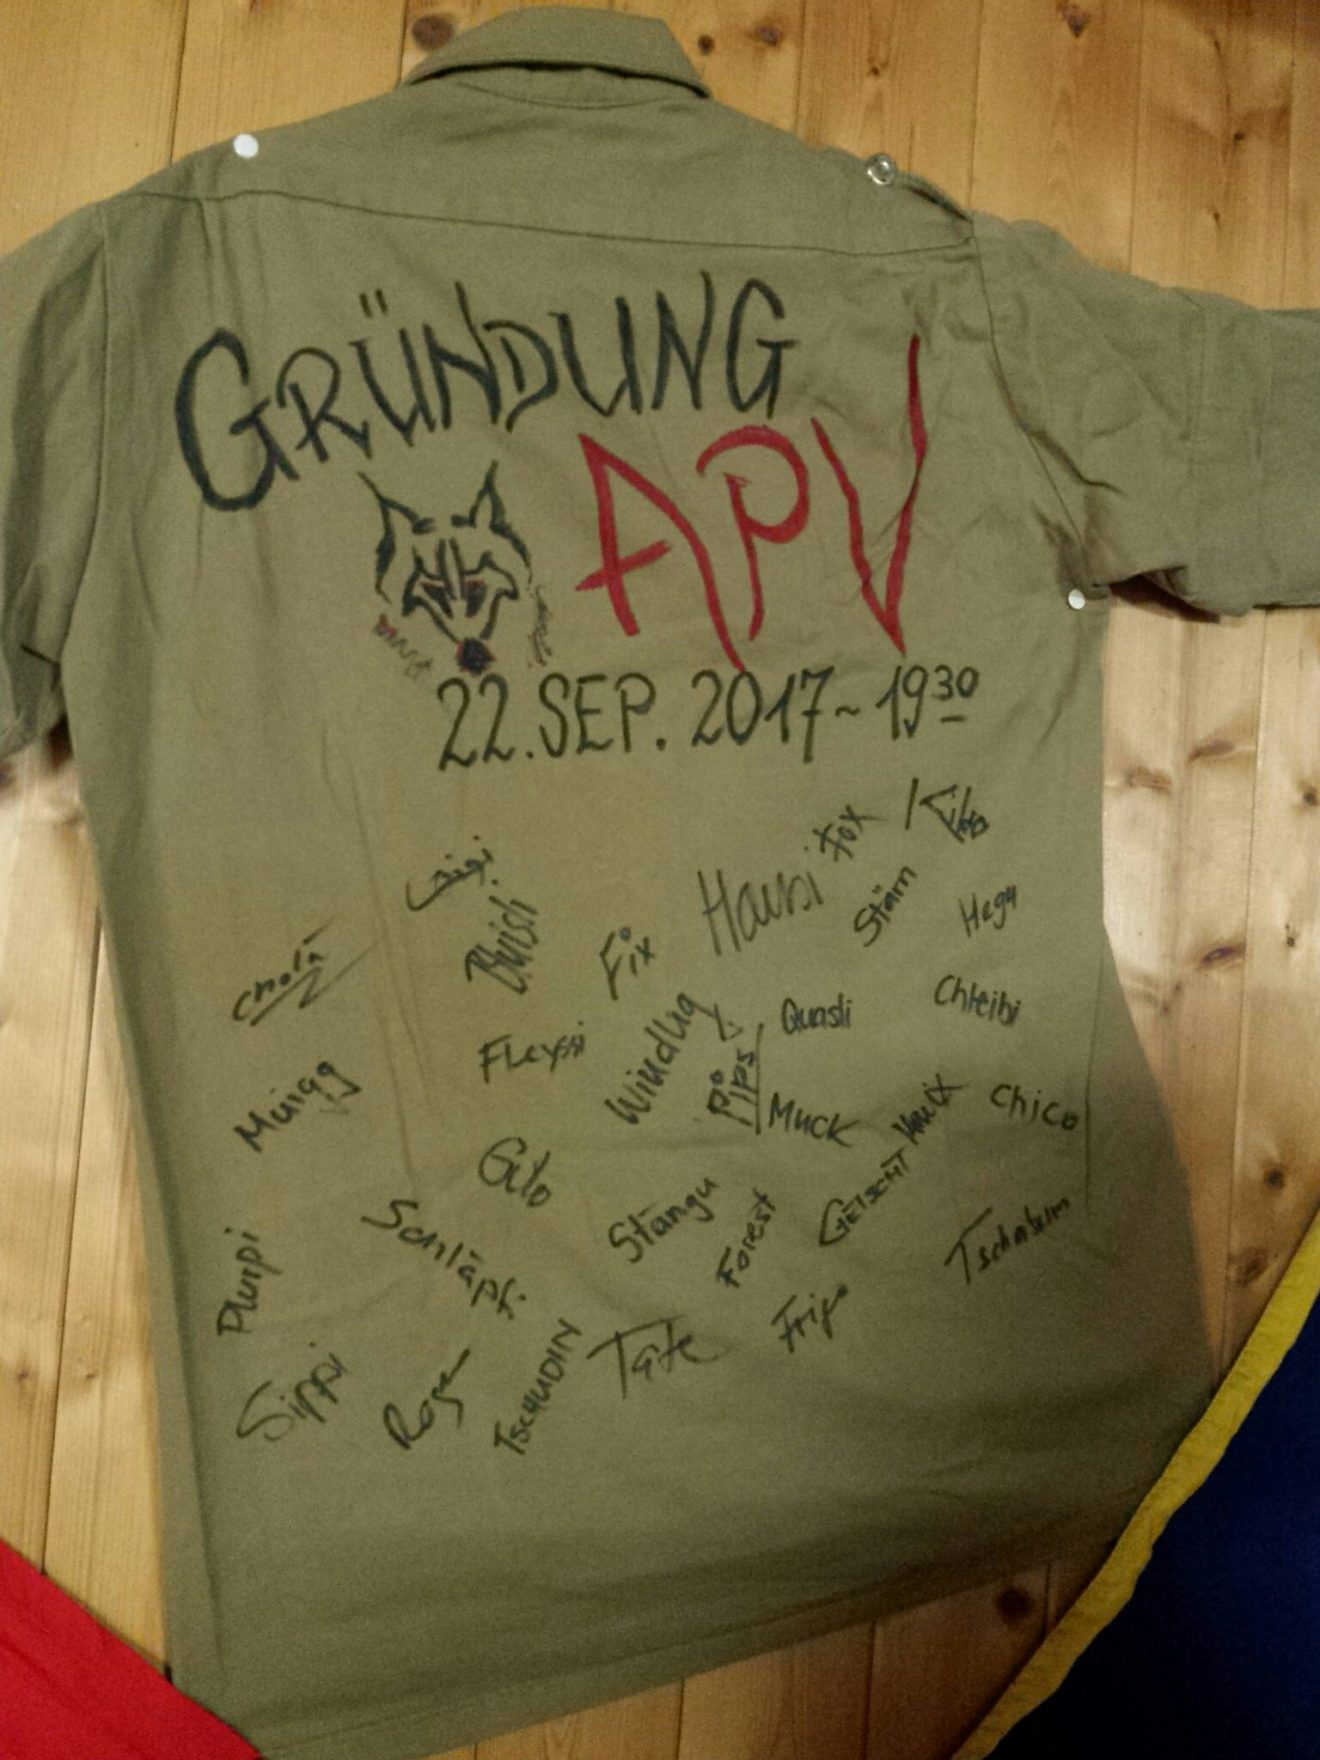 Apv Gruendung 8